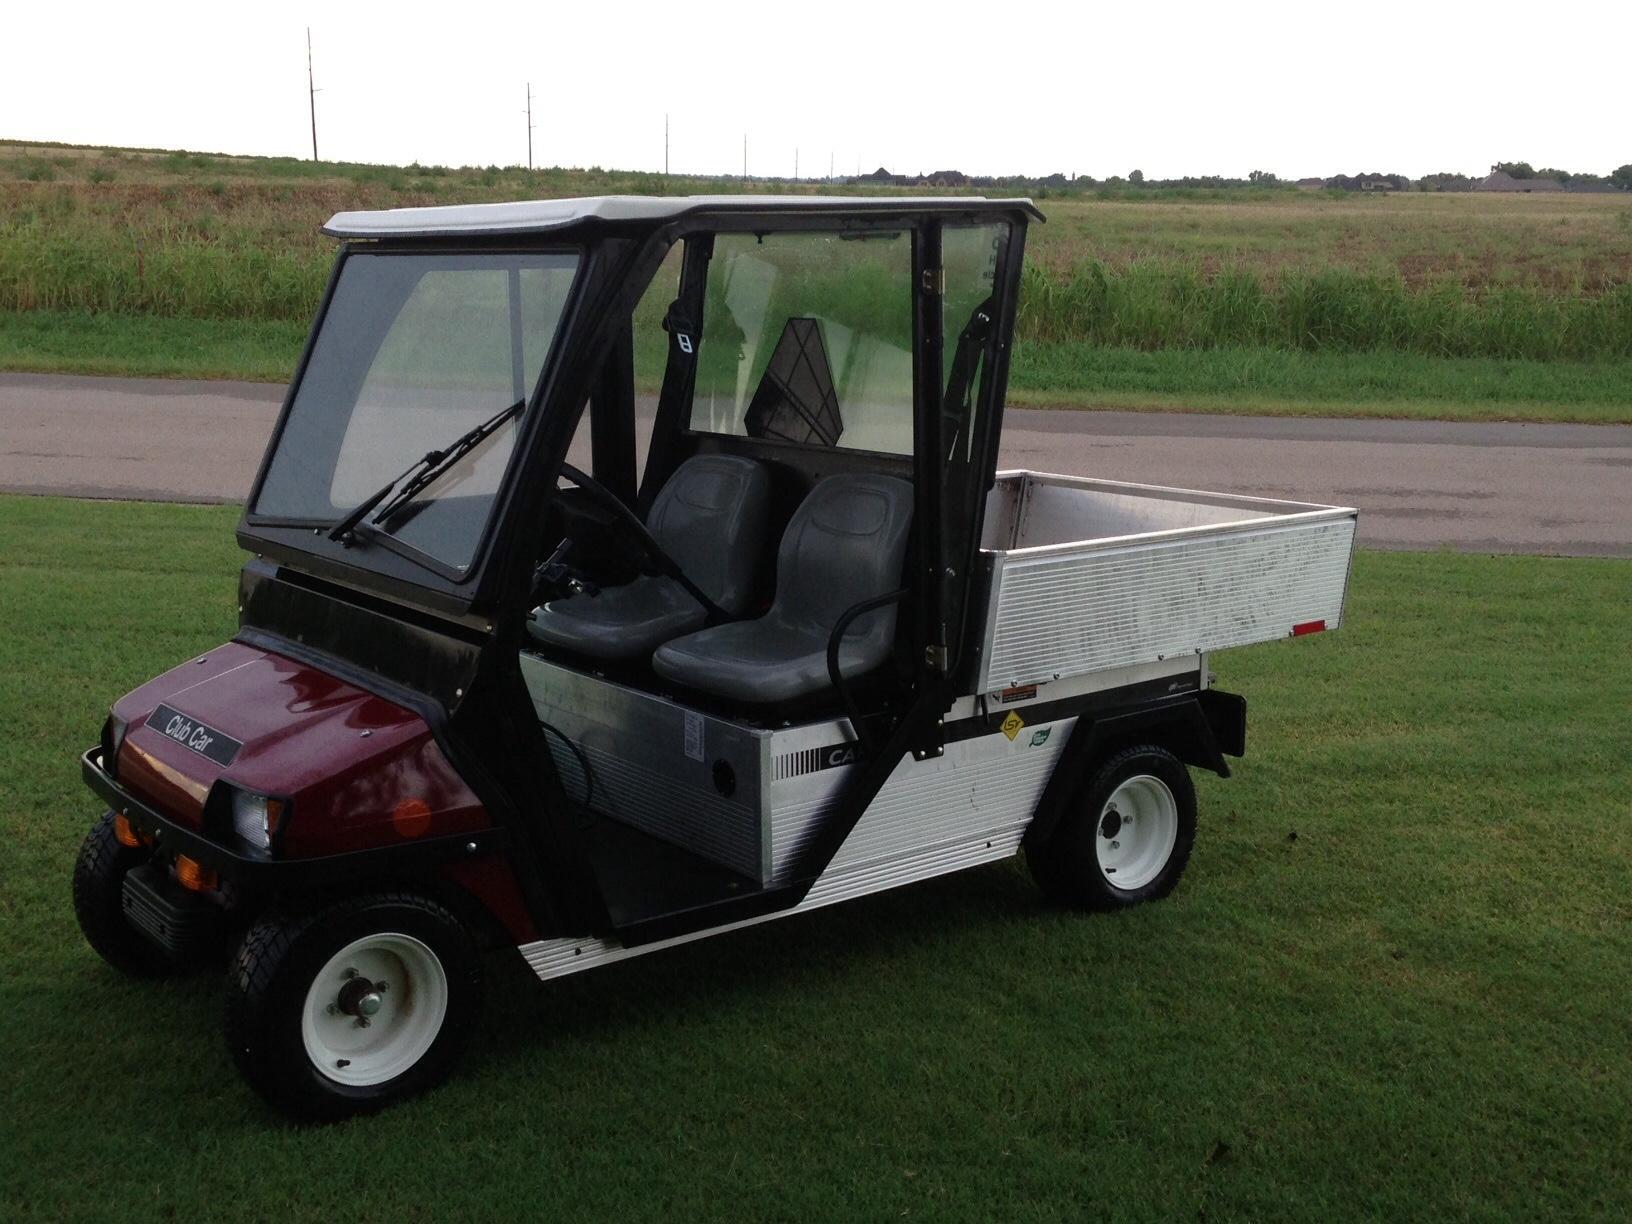 Precedent - Golf Car Inventory - Sold Golf Cars - SOLD ...  |Margaritaville Golf Cart Craigslist